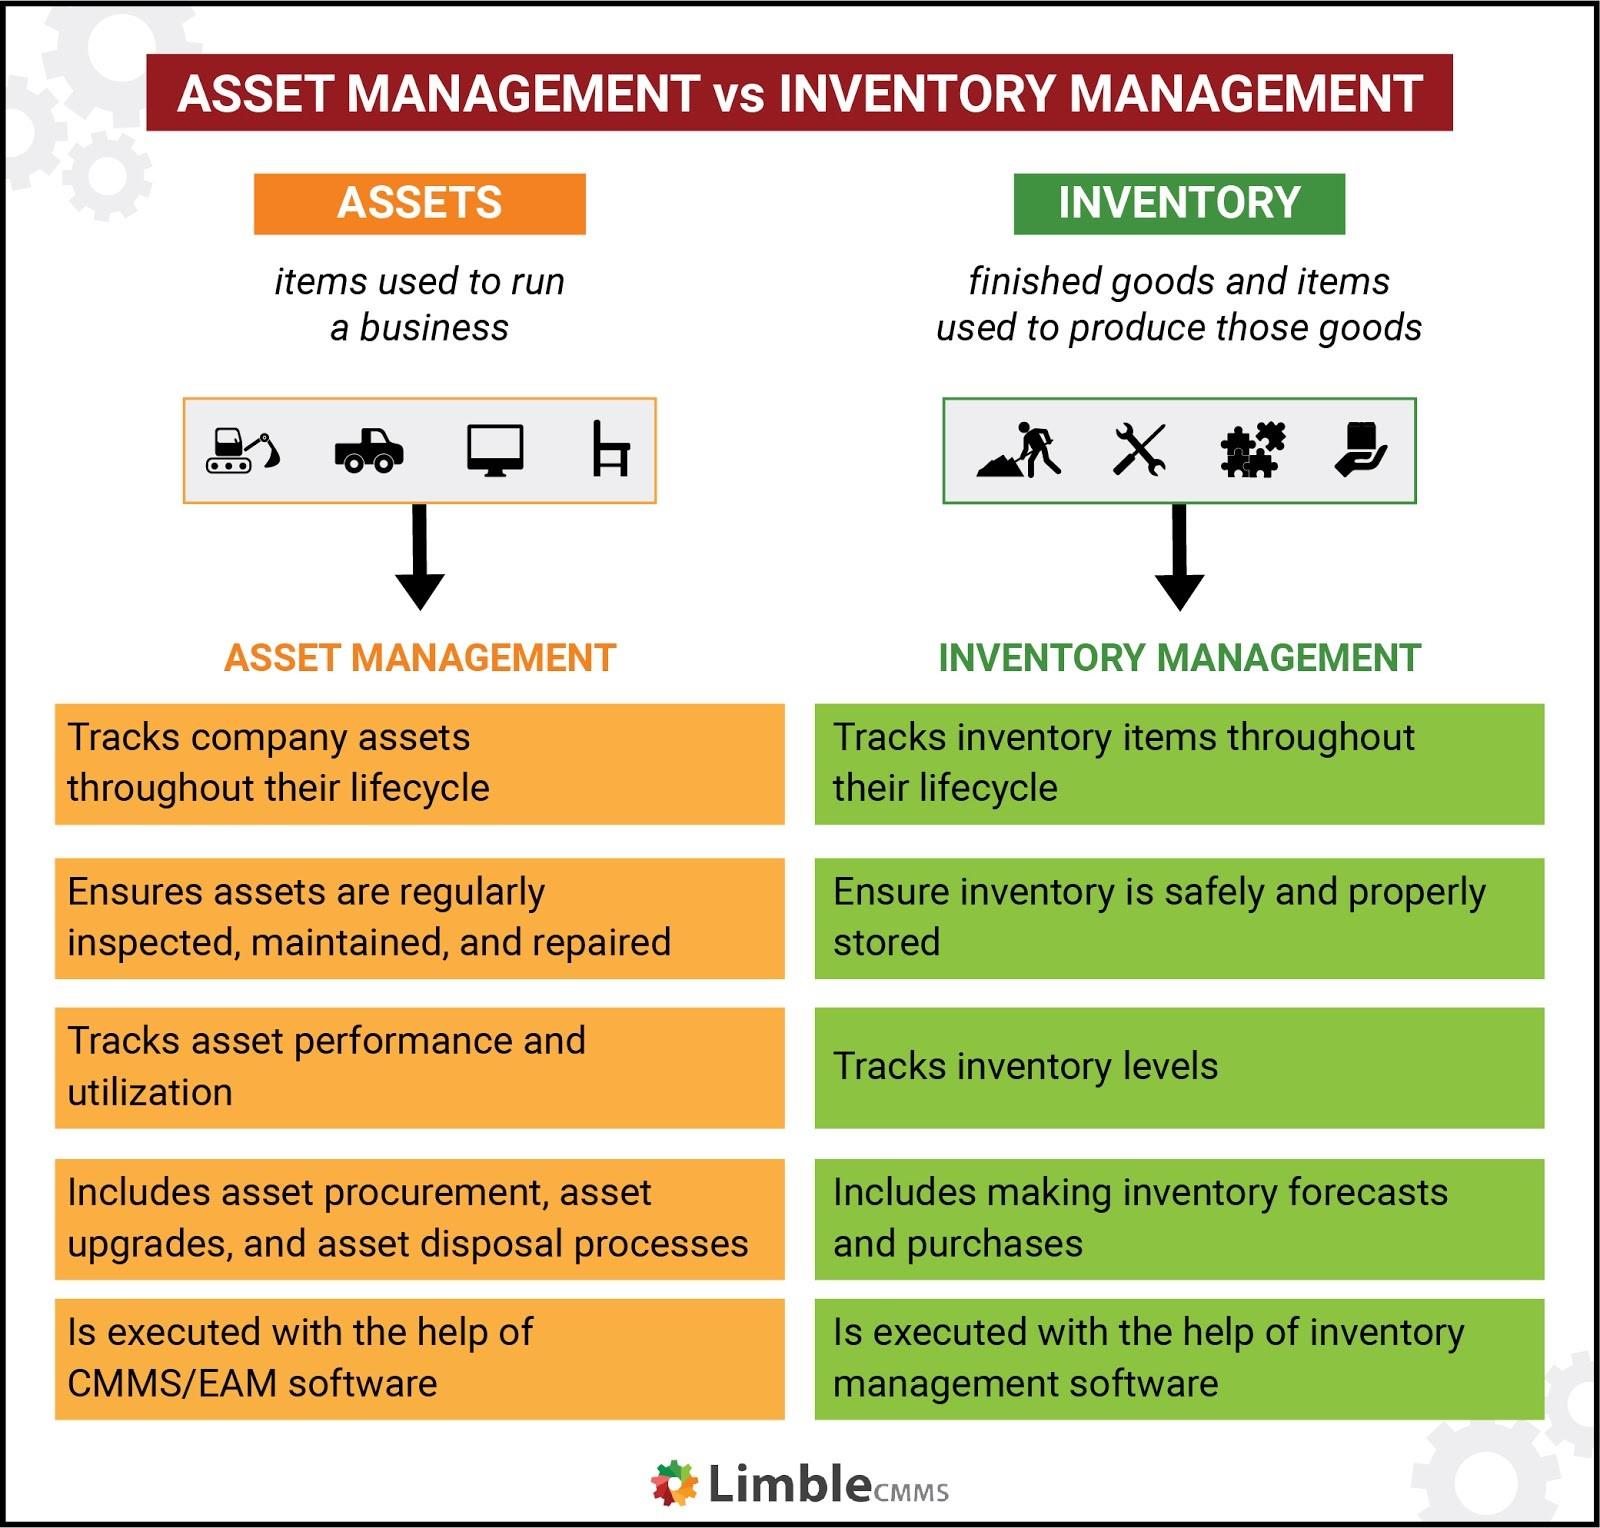 asset management vs inventory management